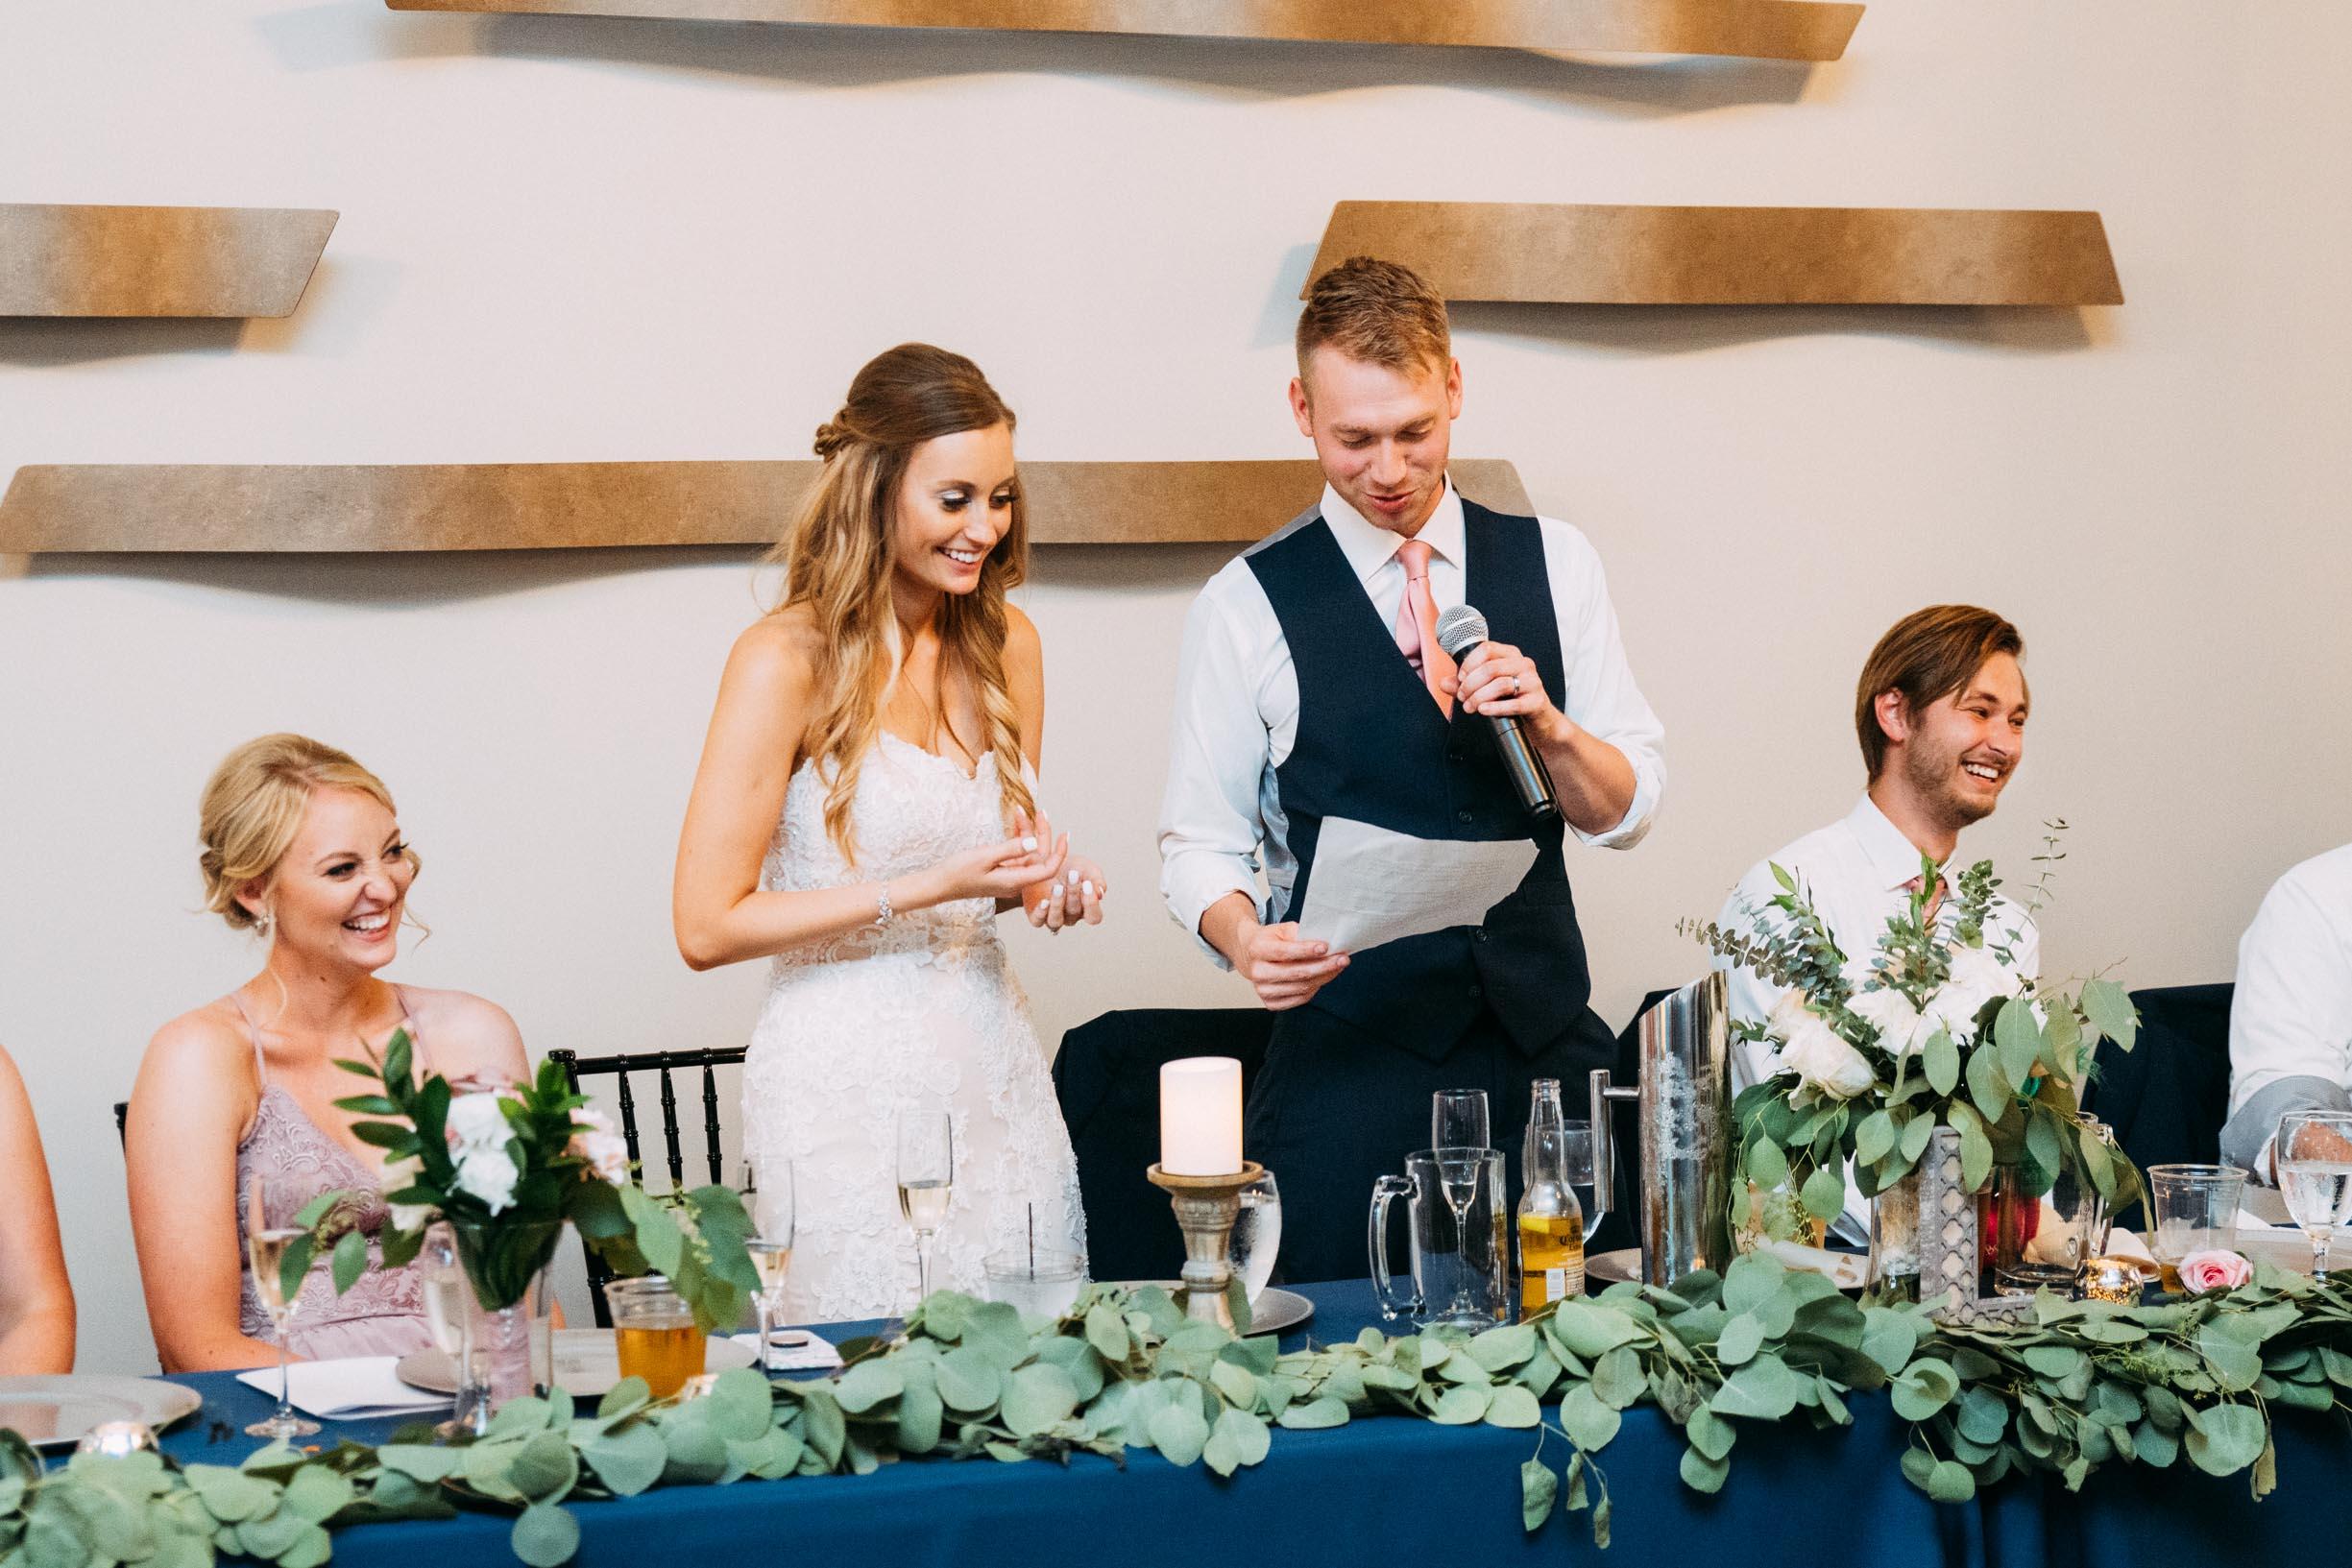 69-WeddingsattheBroz_Minnesota_WeddingBlog_Reception.jpg